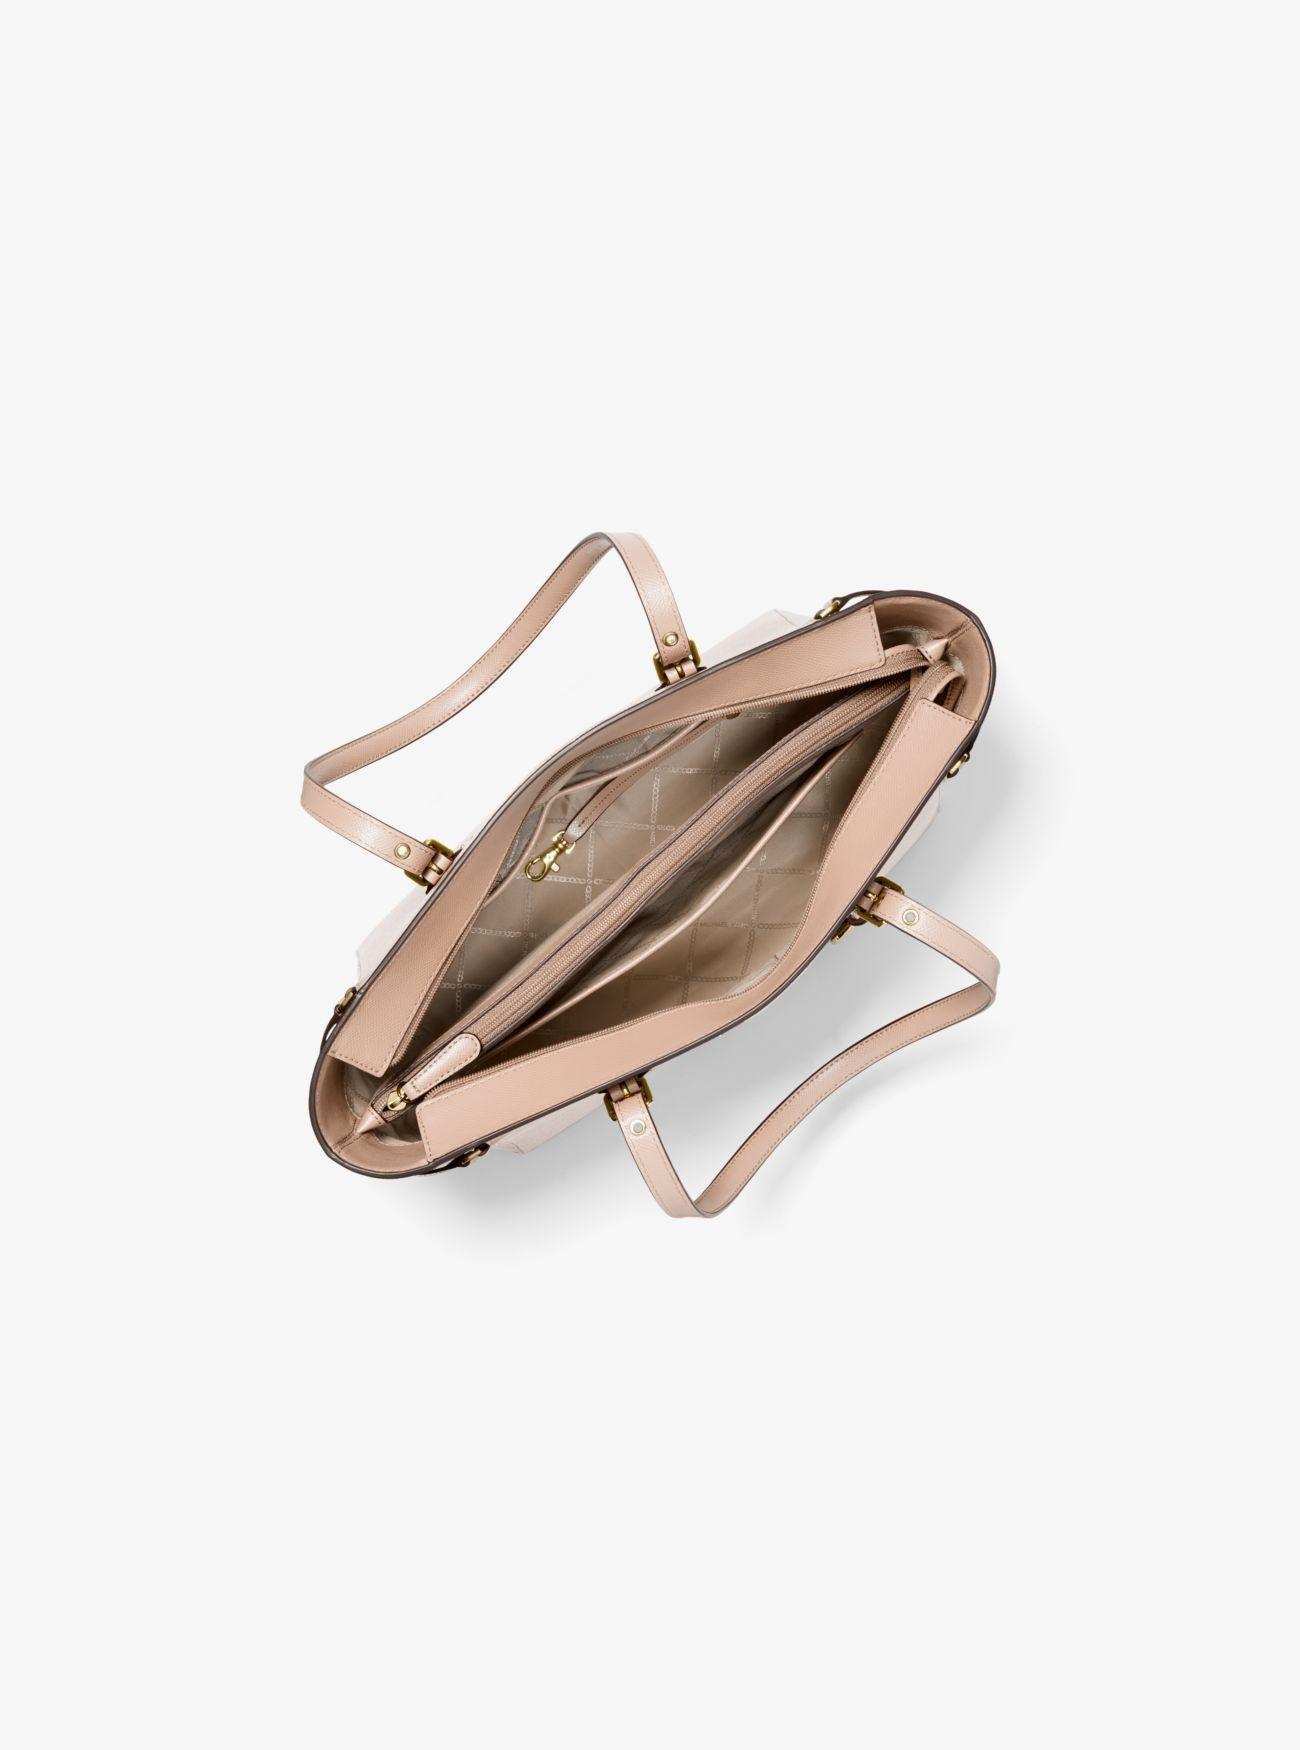 1a89816fdae7 Michael Kors - Pink Voyager Medium Leather Tote - Lyst. View fullscreen